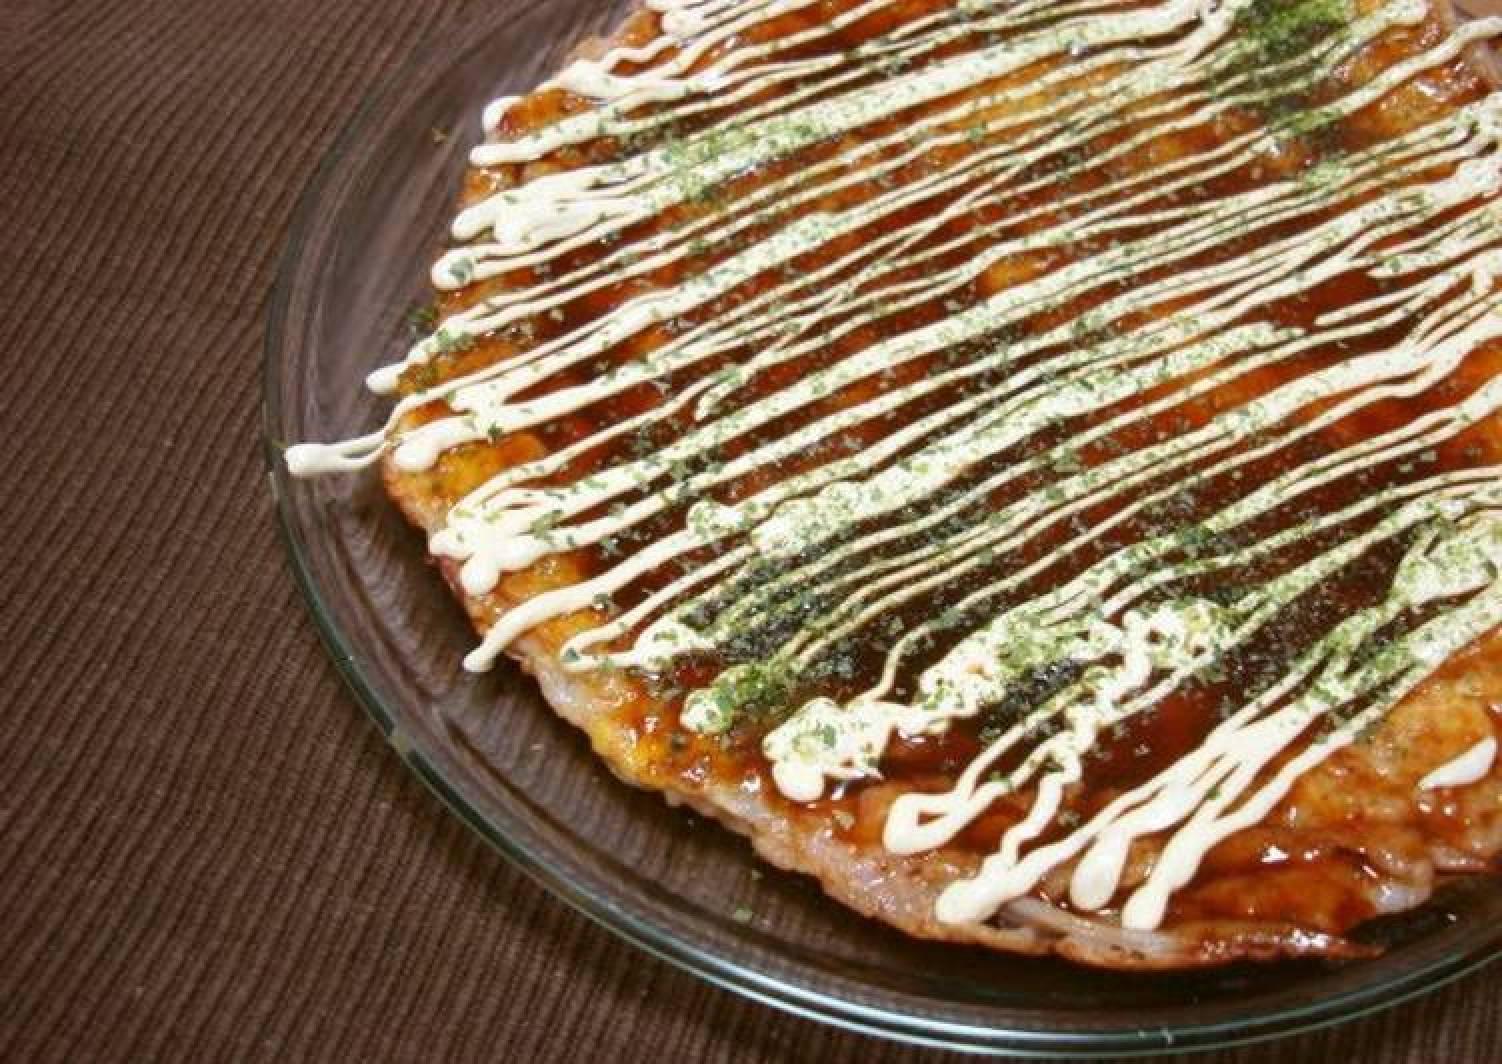 Ika Yaki - Squid Okonomiyaki